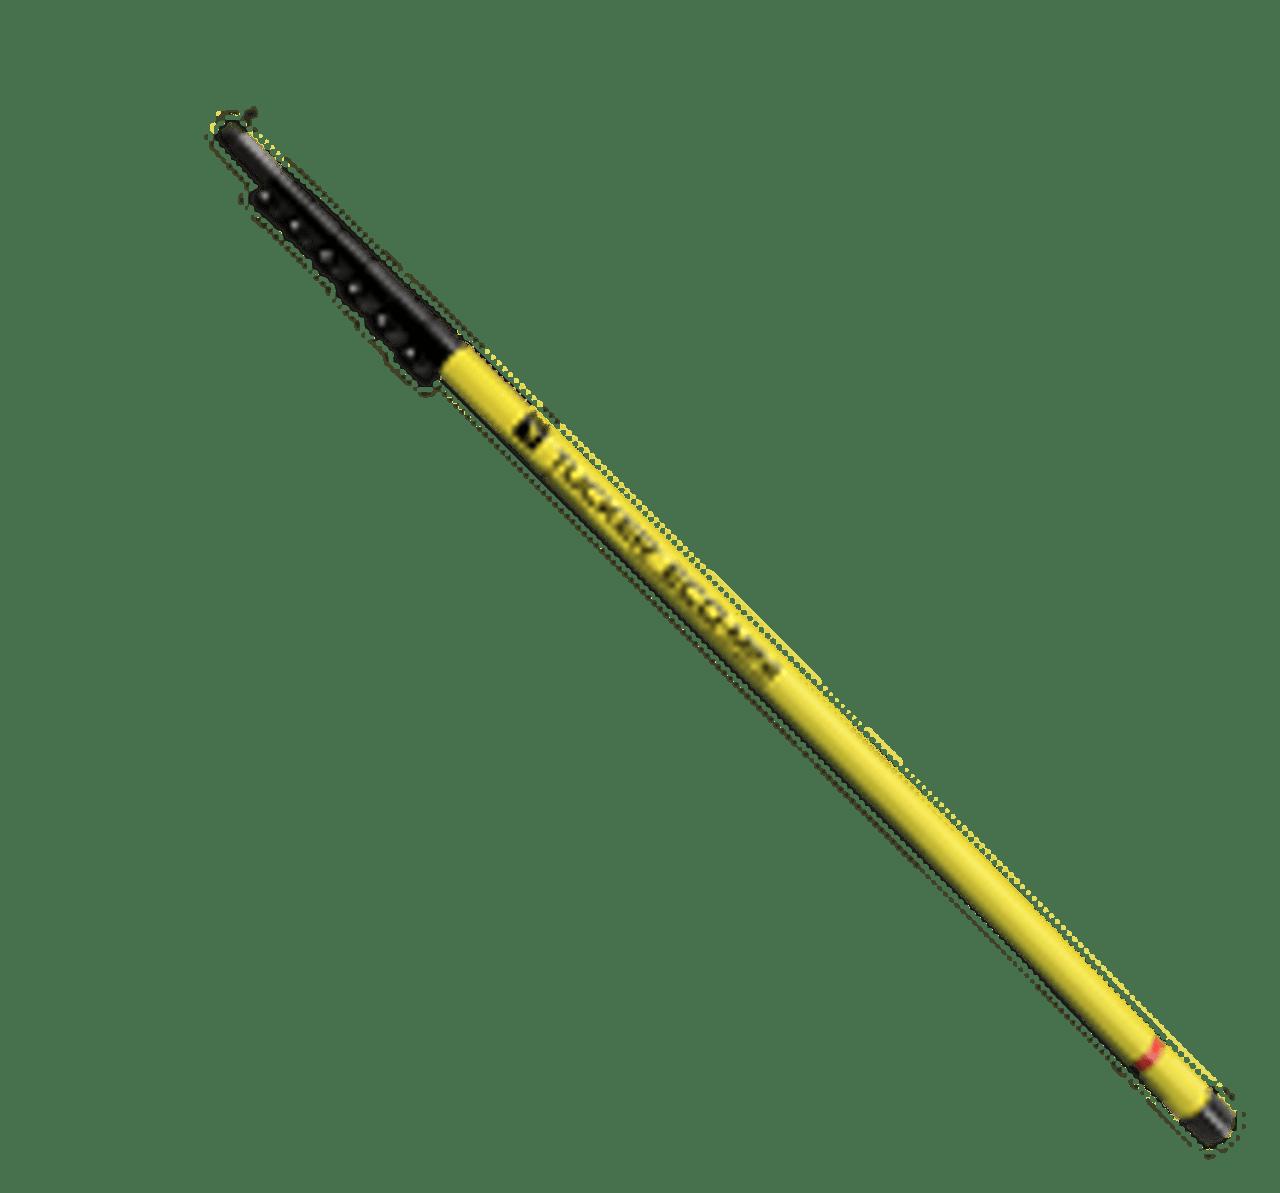 Custom built eco mini carbon fiber water fed pole by tucker